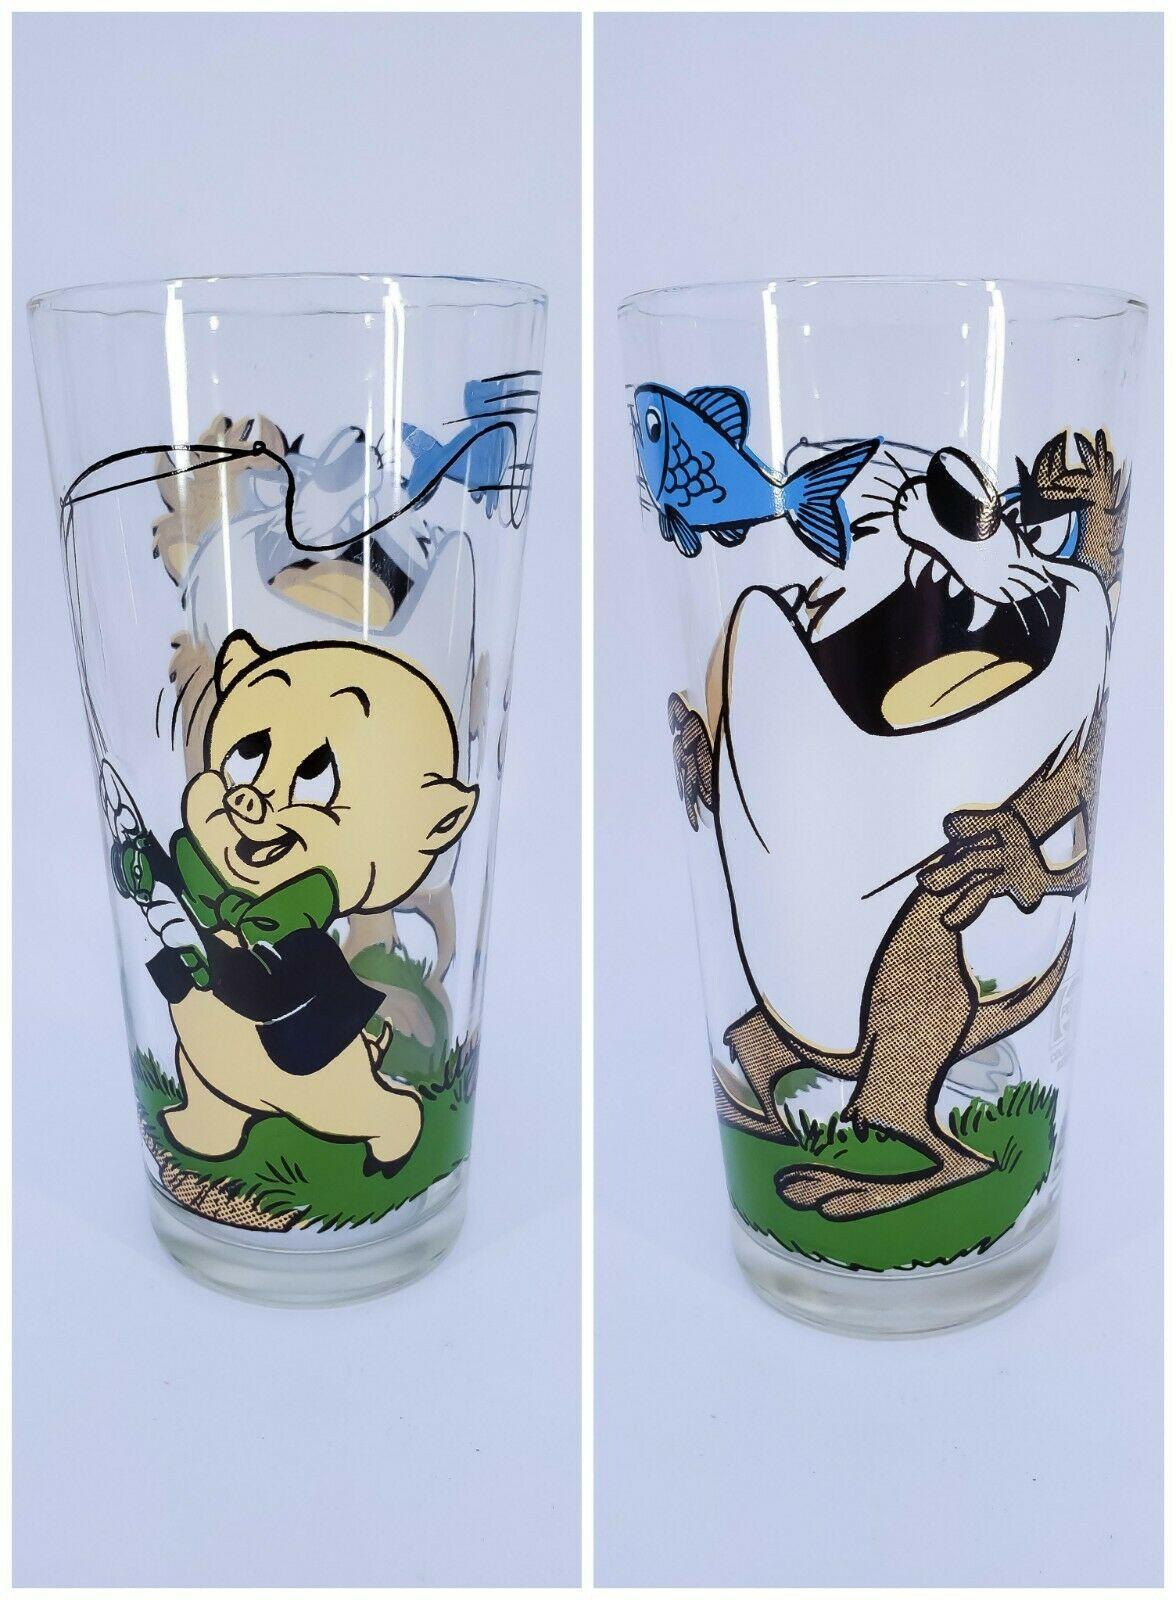 ORIGINAL Vintage 1976 Pepsi Tasmanian Devil Taz Porky Pig Drinking Glass - $34.64